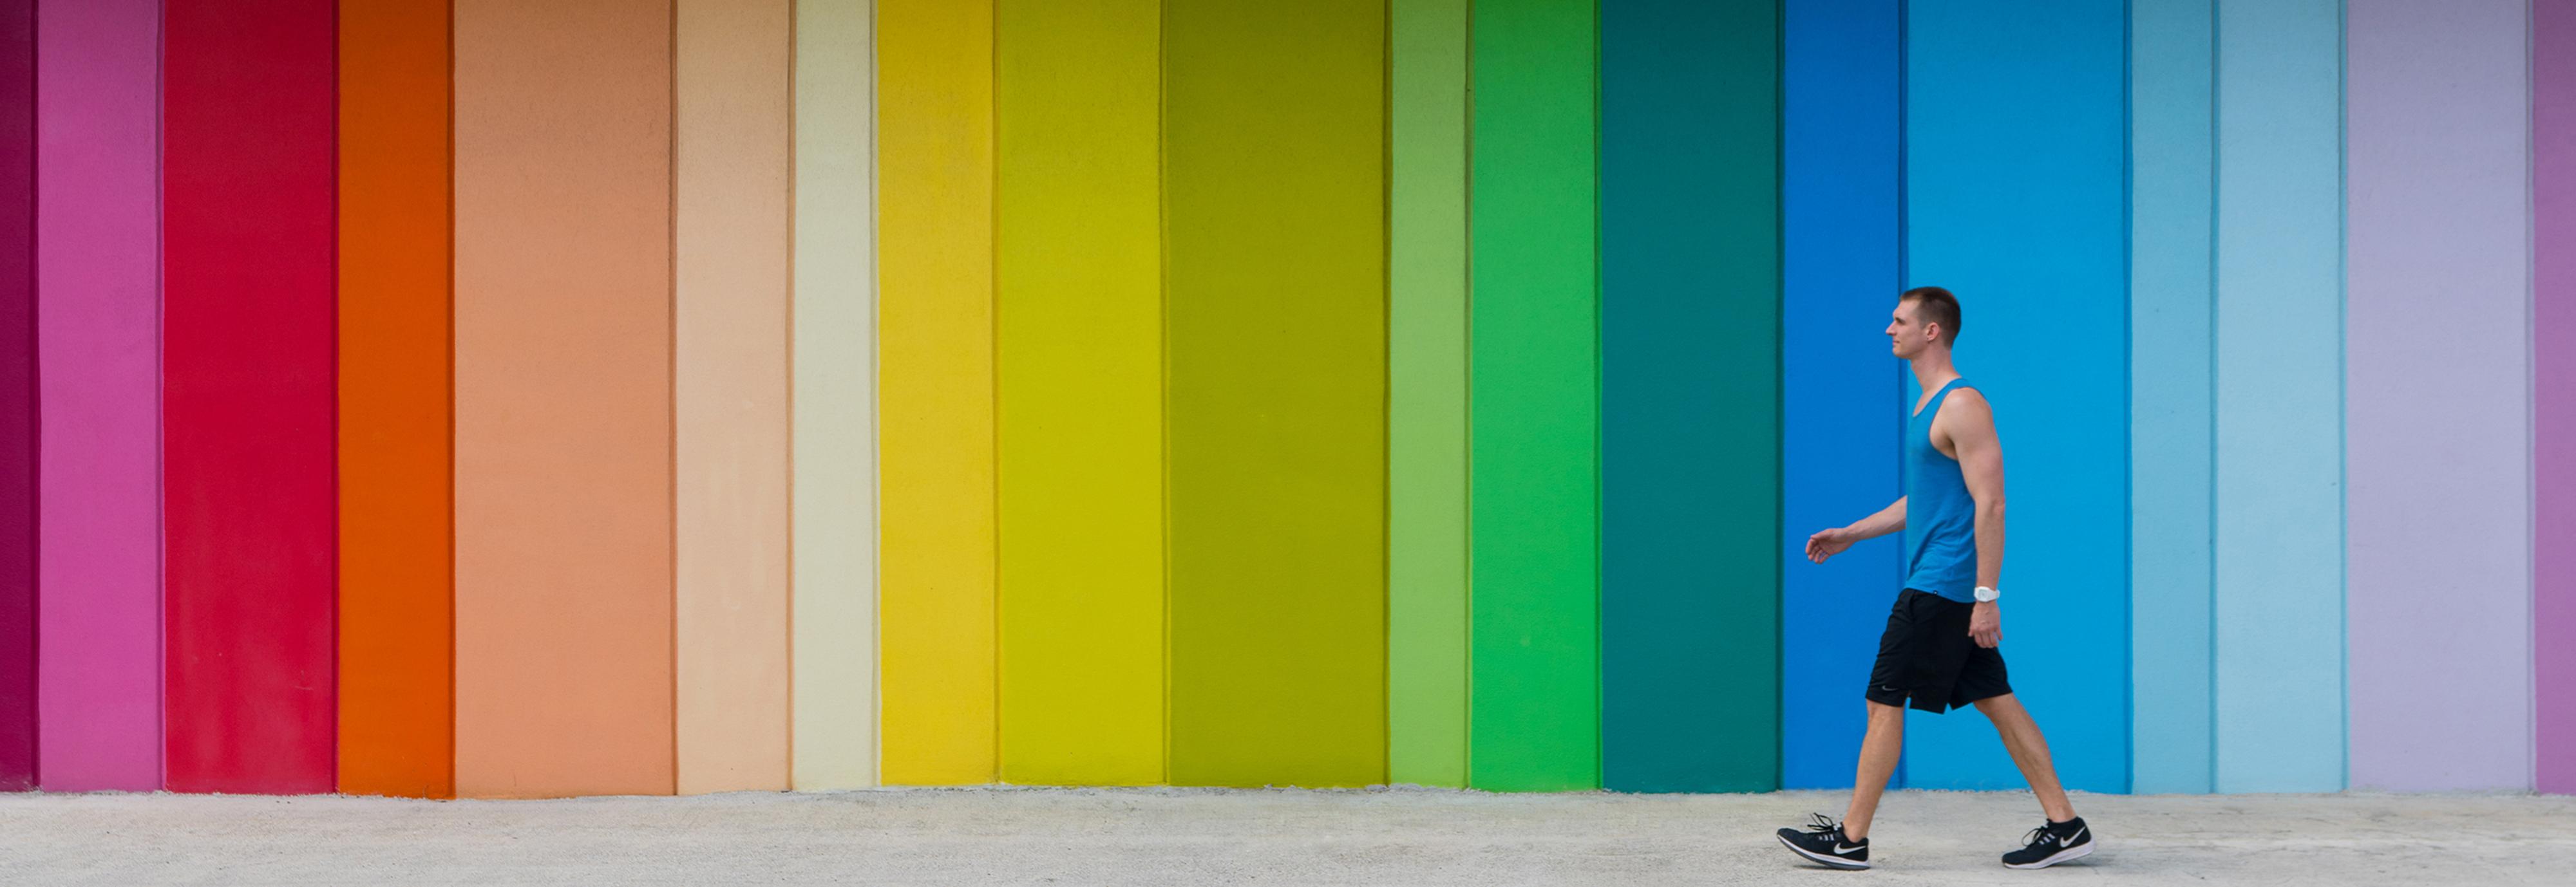 Rainbowwallstride puertorico banner